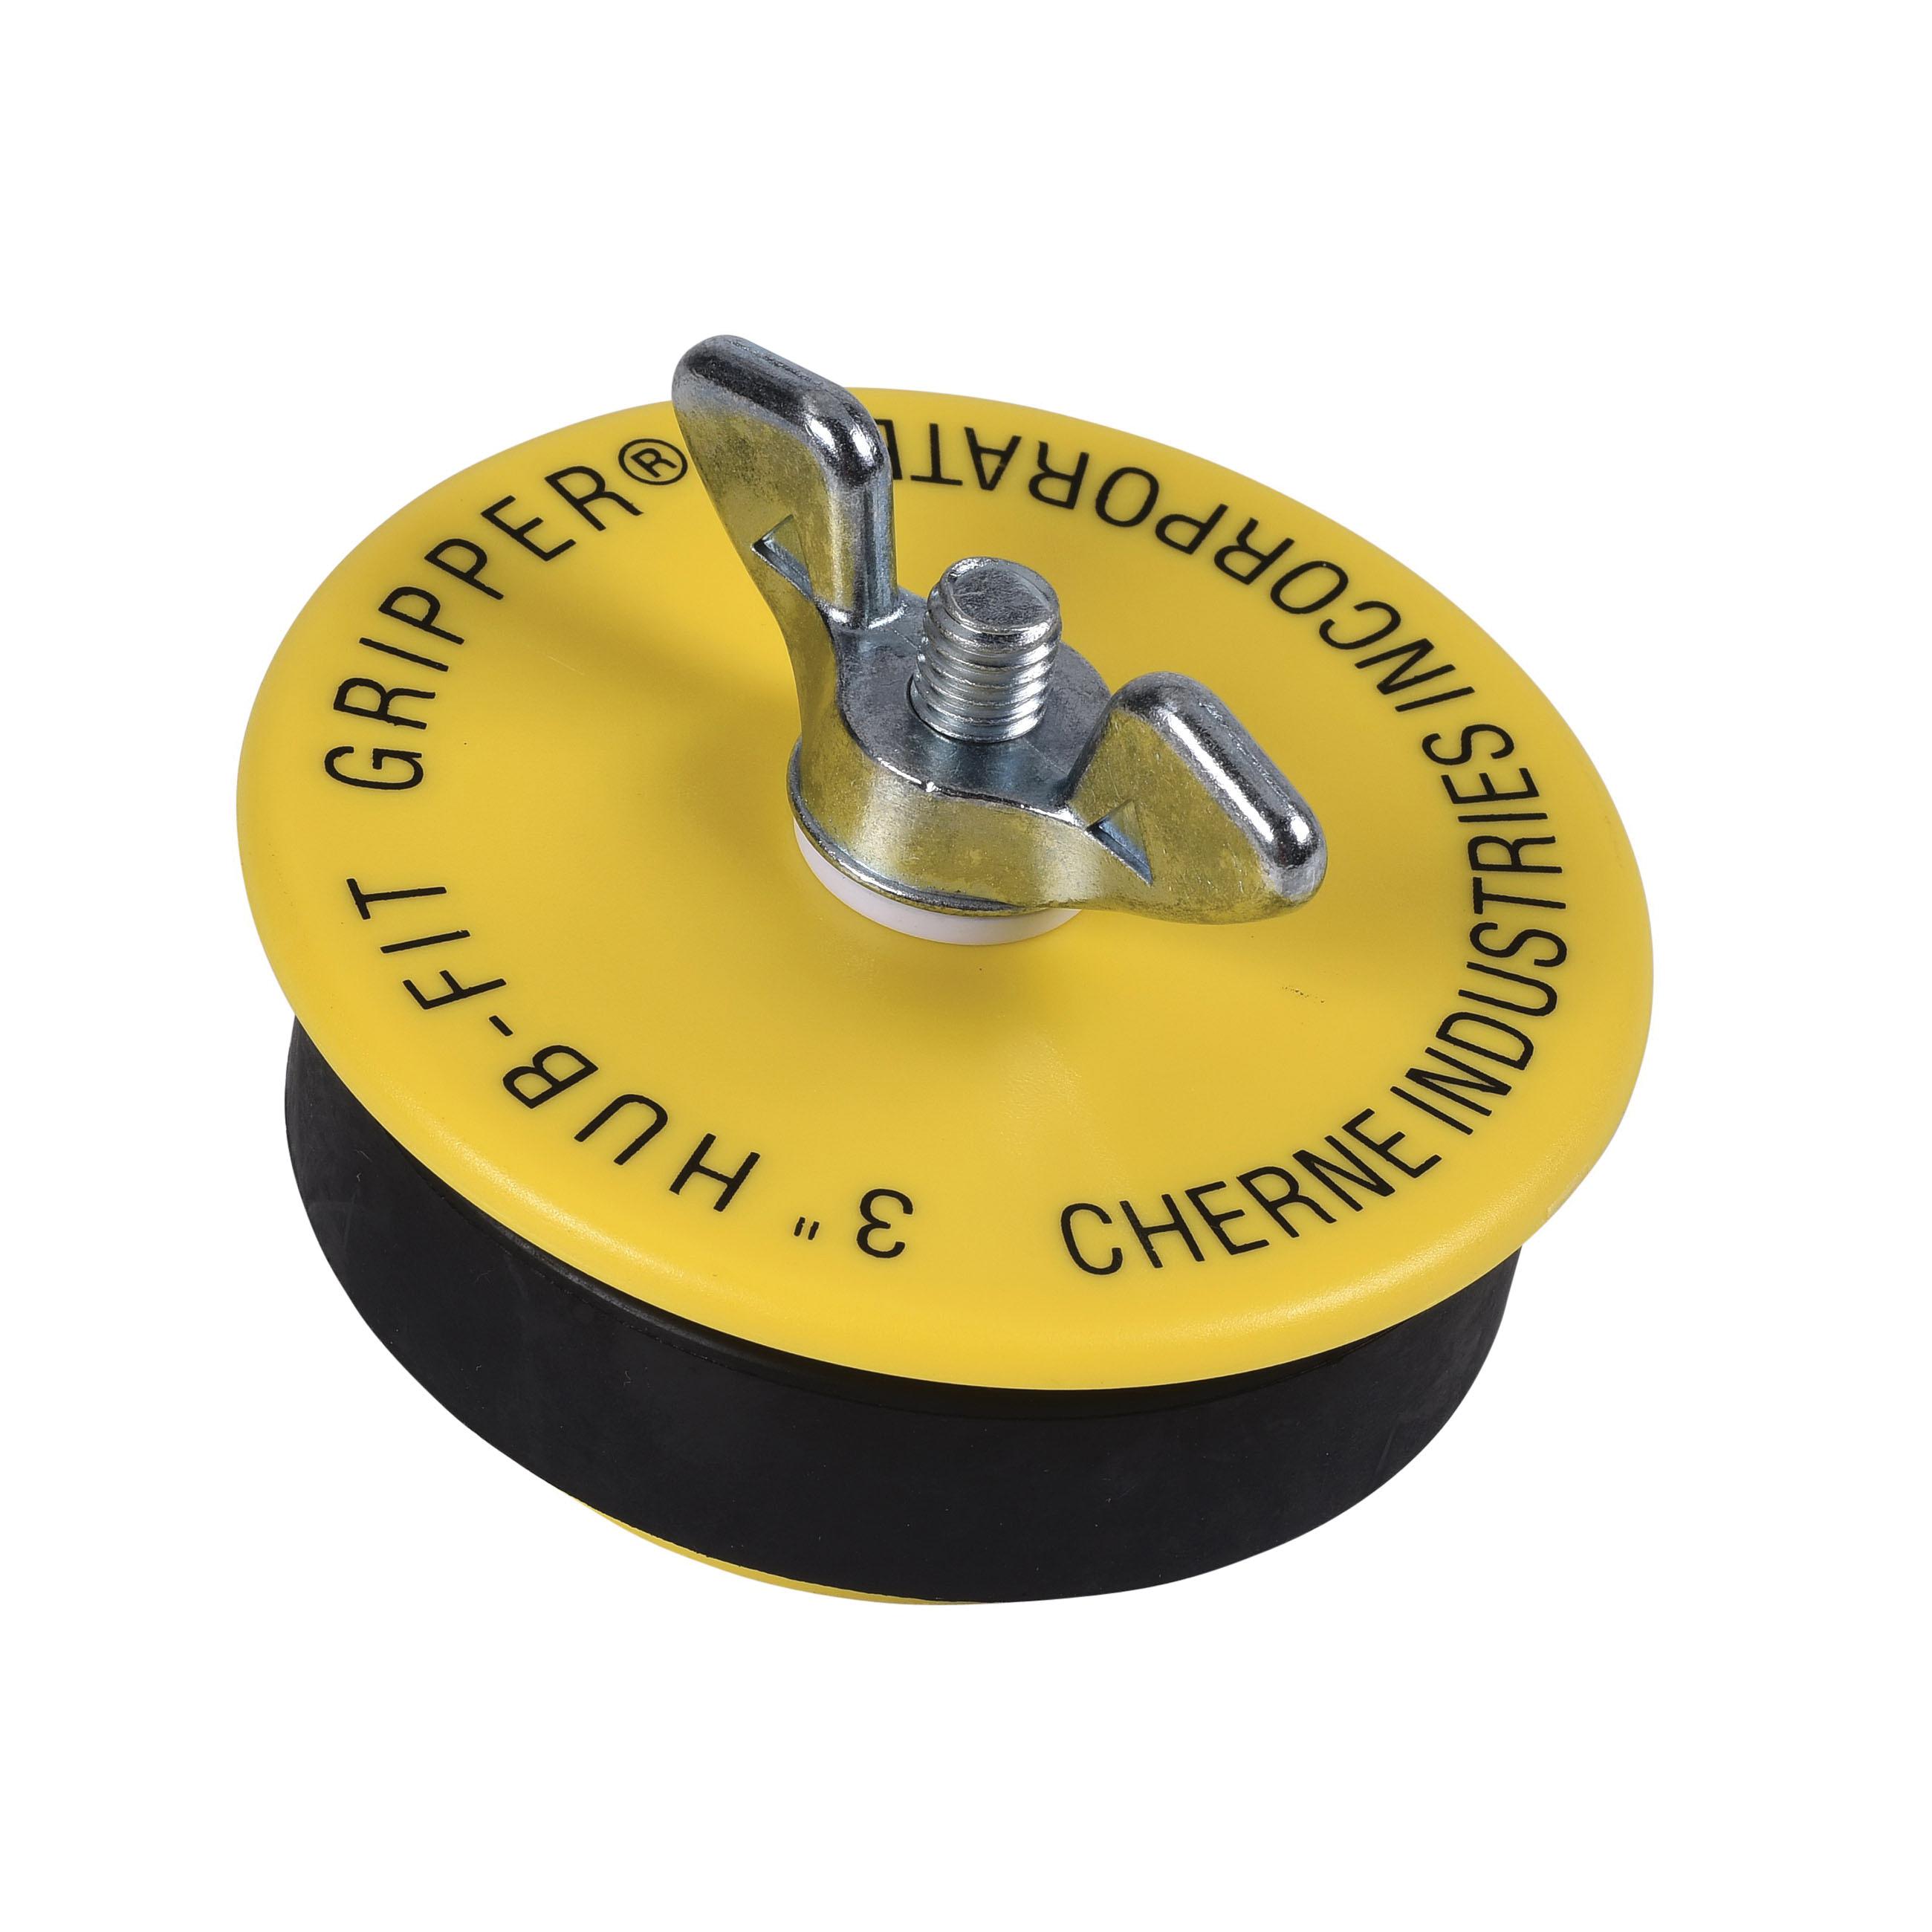 Cherne® Hub-Fit Gripper® 270538 Mechanical Pipe Plug, 3 in, ABS